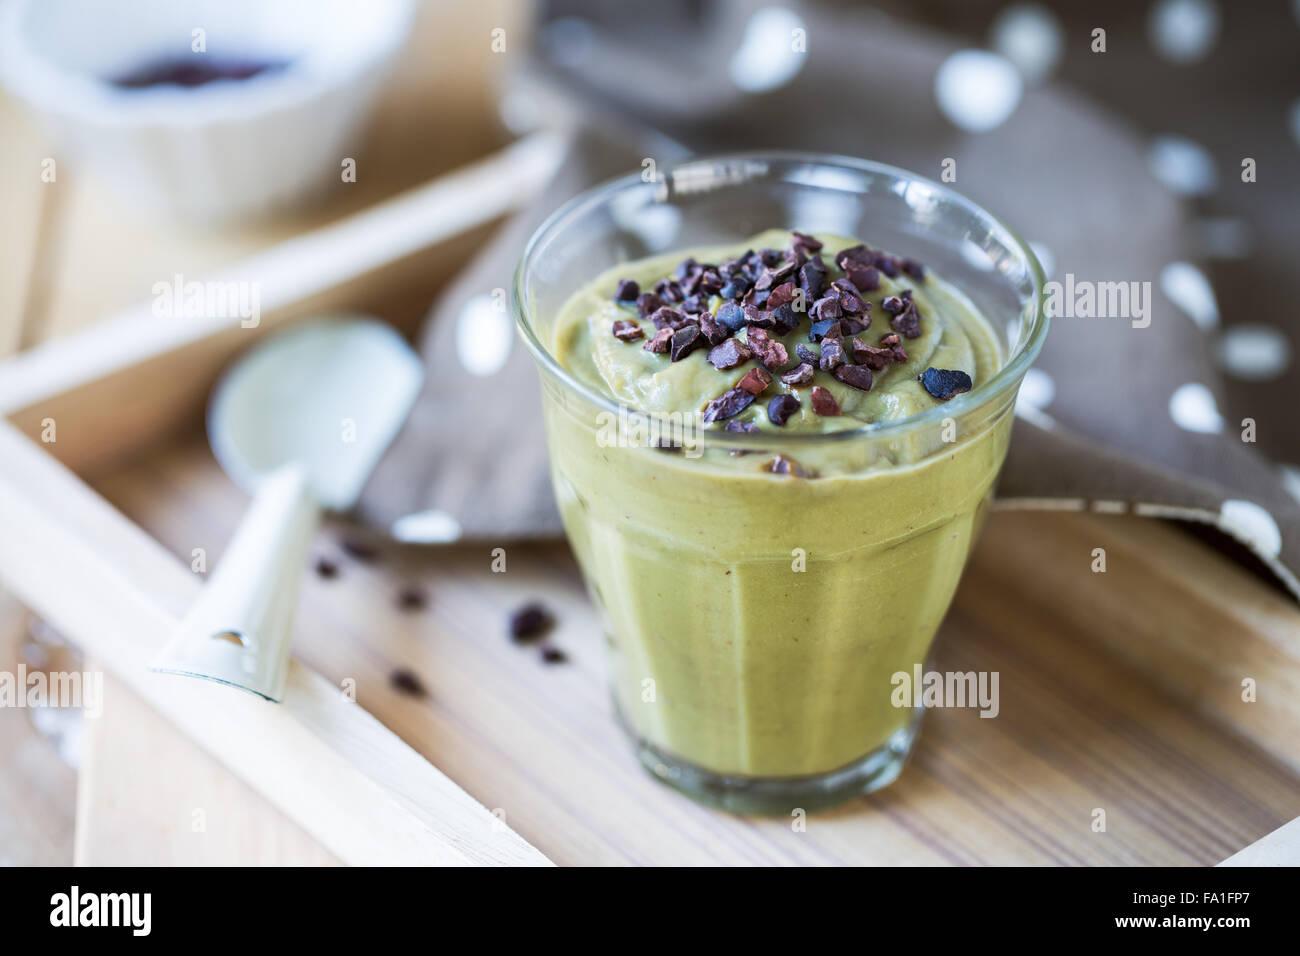 Homemade Avocado smoothie with Cacao nibs - Stock Image